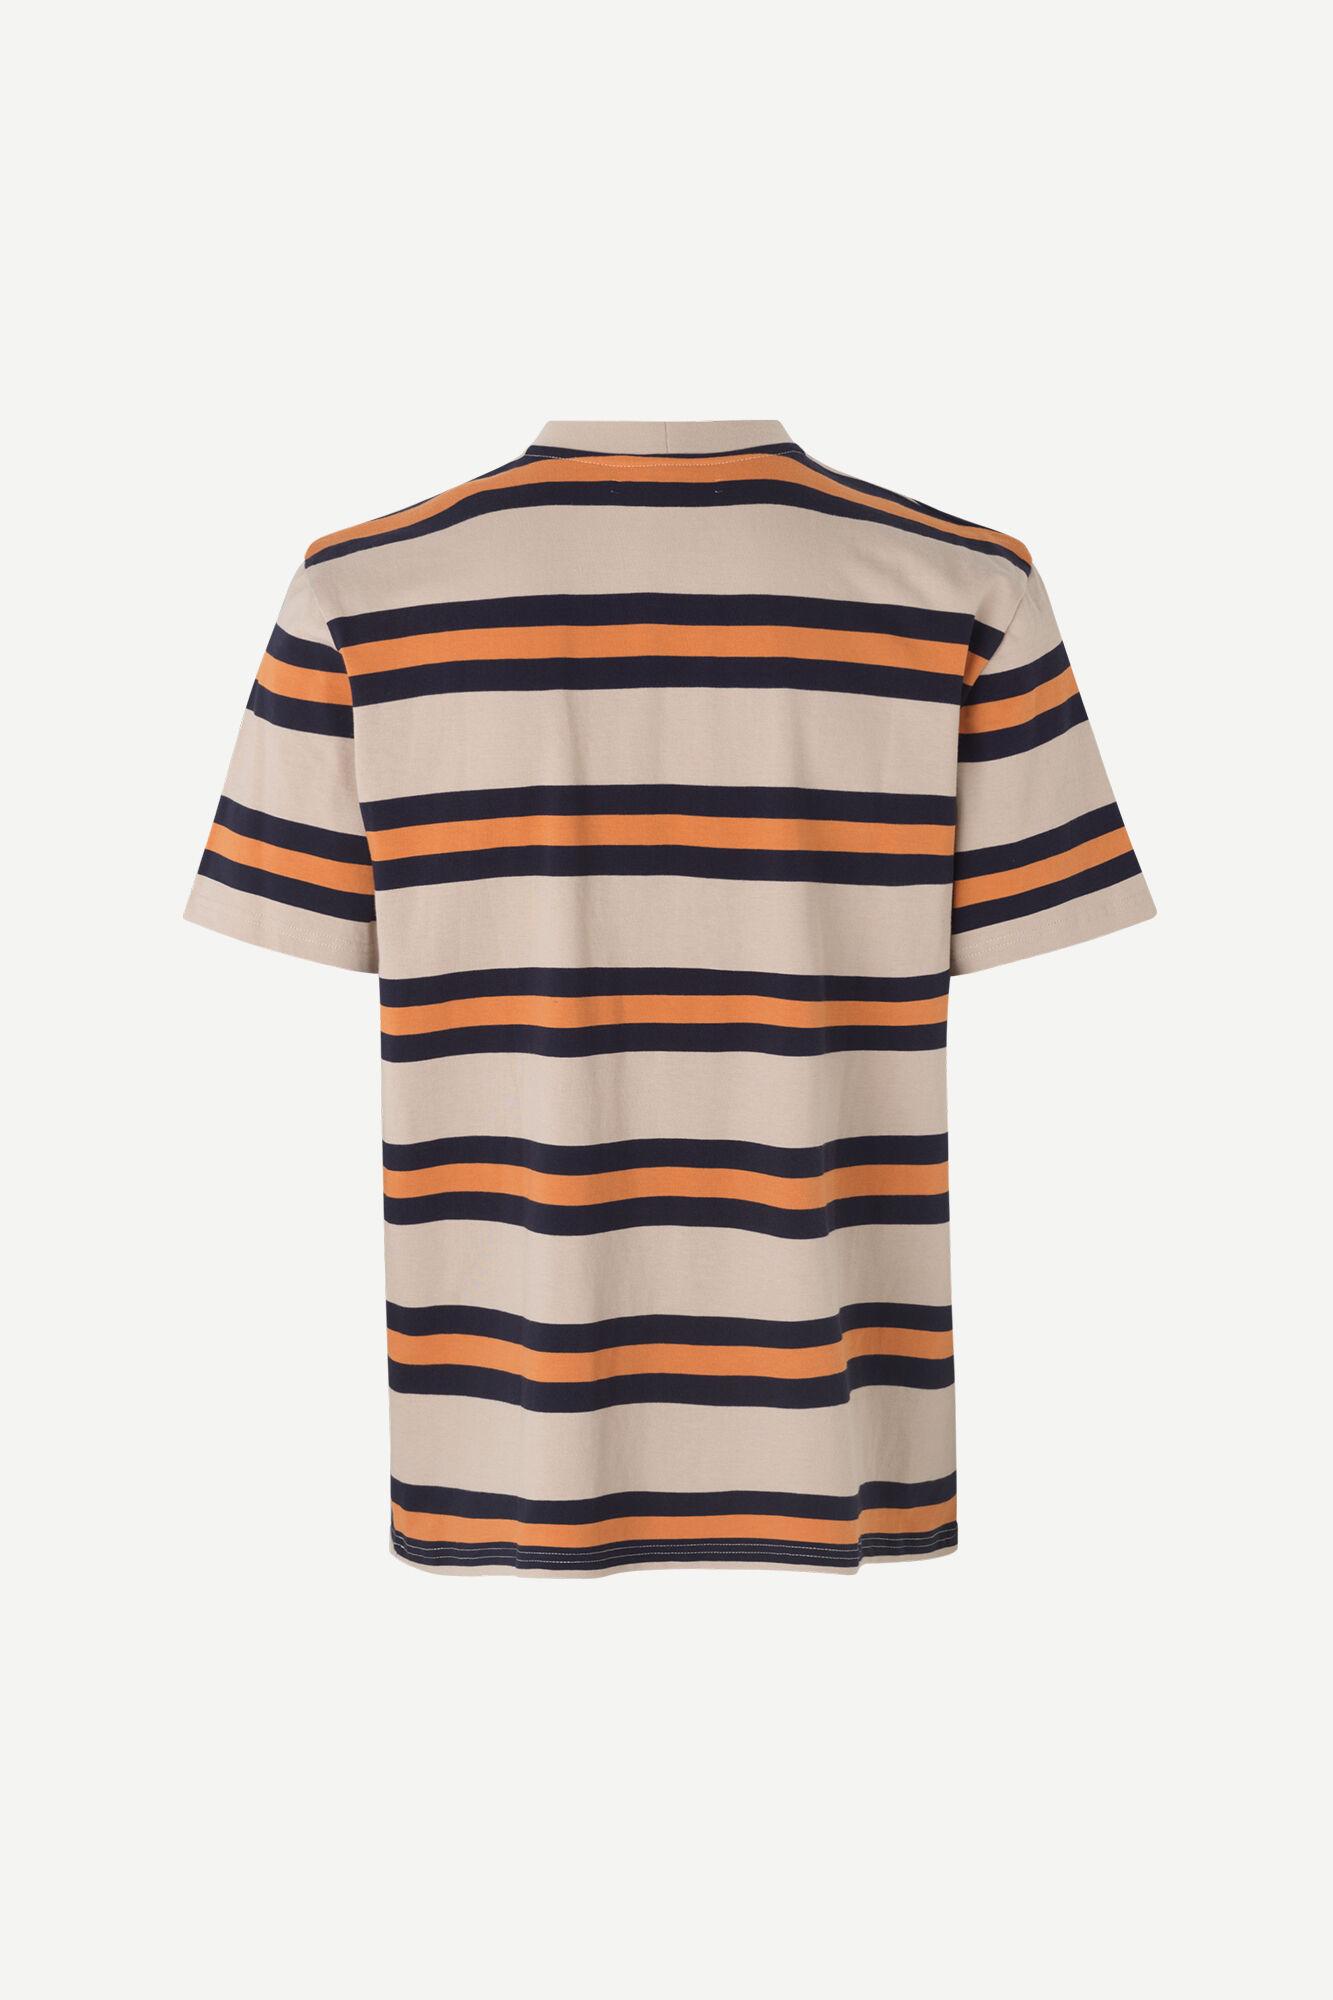 Norsbro x t-shirt st 11587